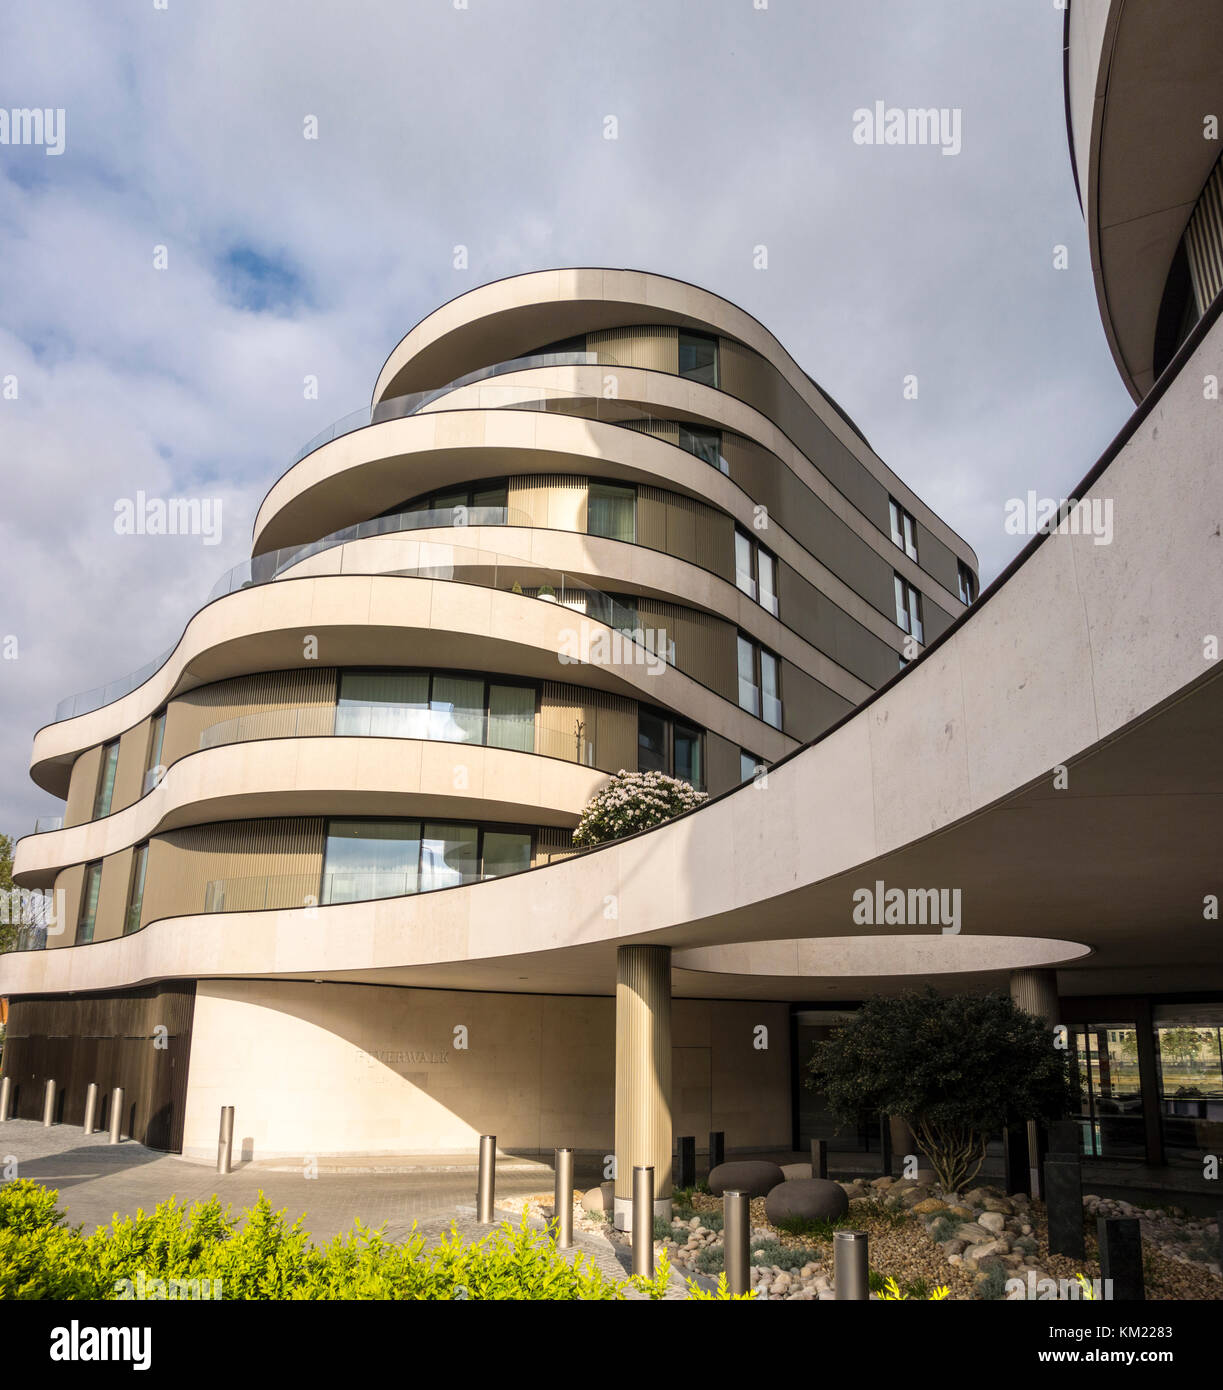 Riverwalk Apartments, Milbank, Westminster, London, UK - Stock Image